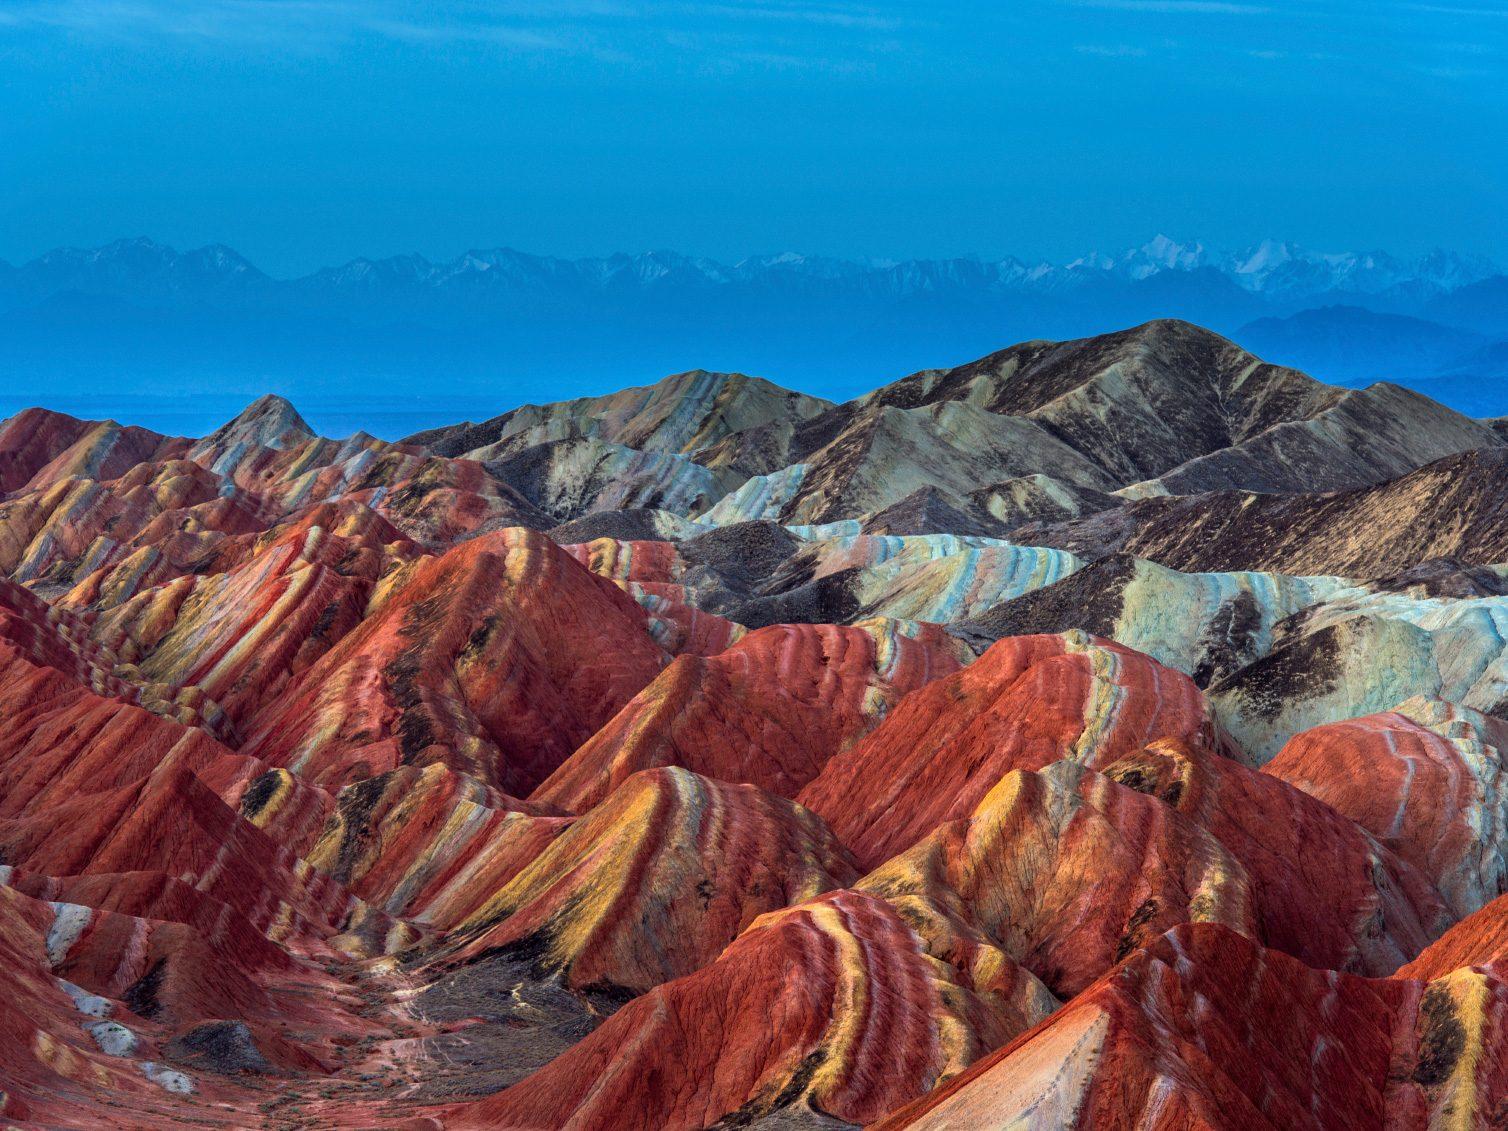 Natural Wonder of China: Danxia landform